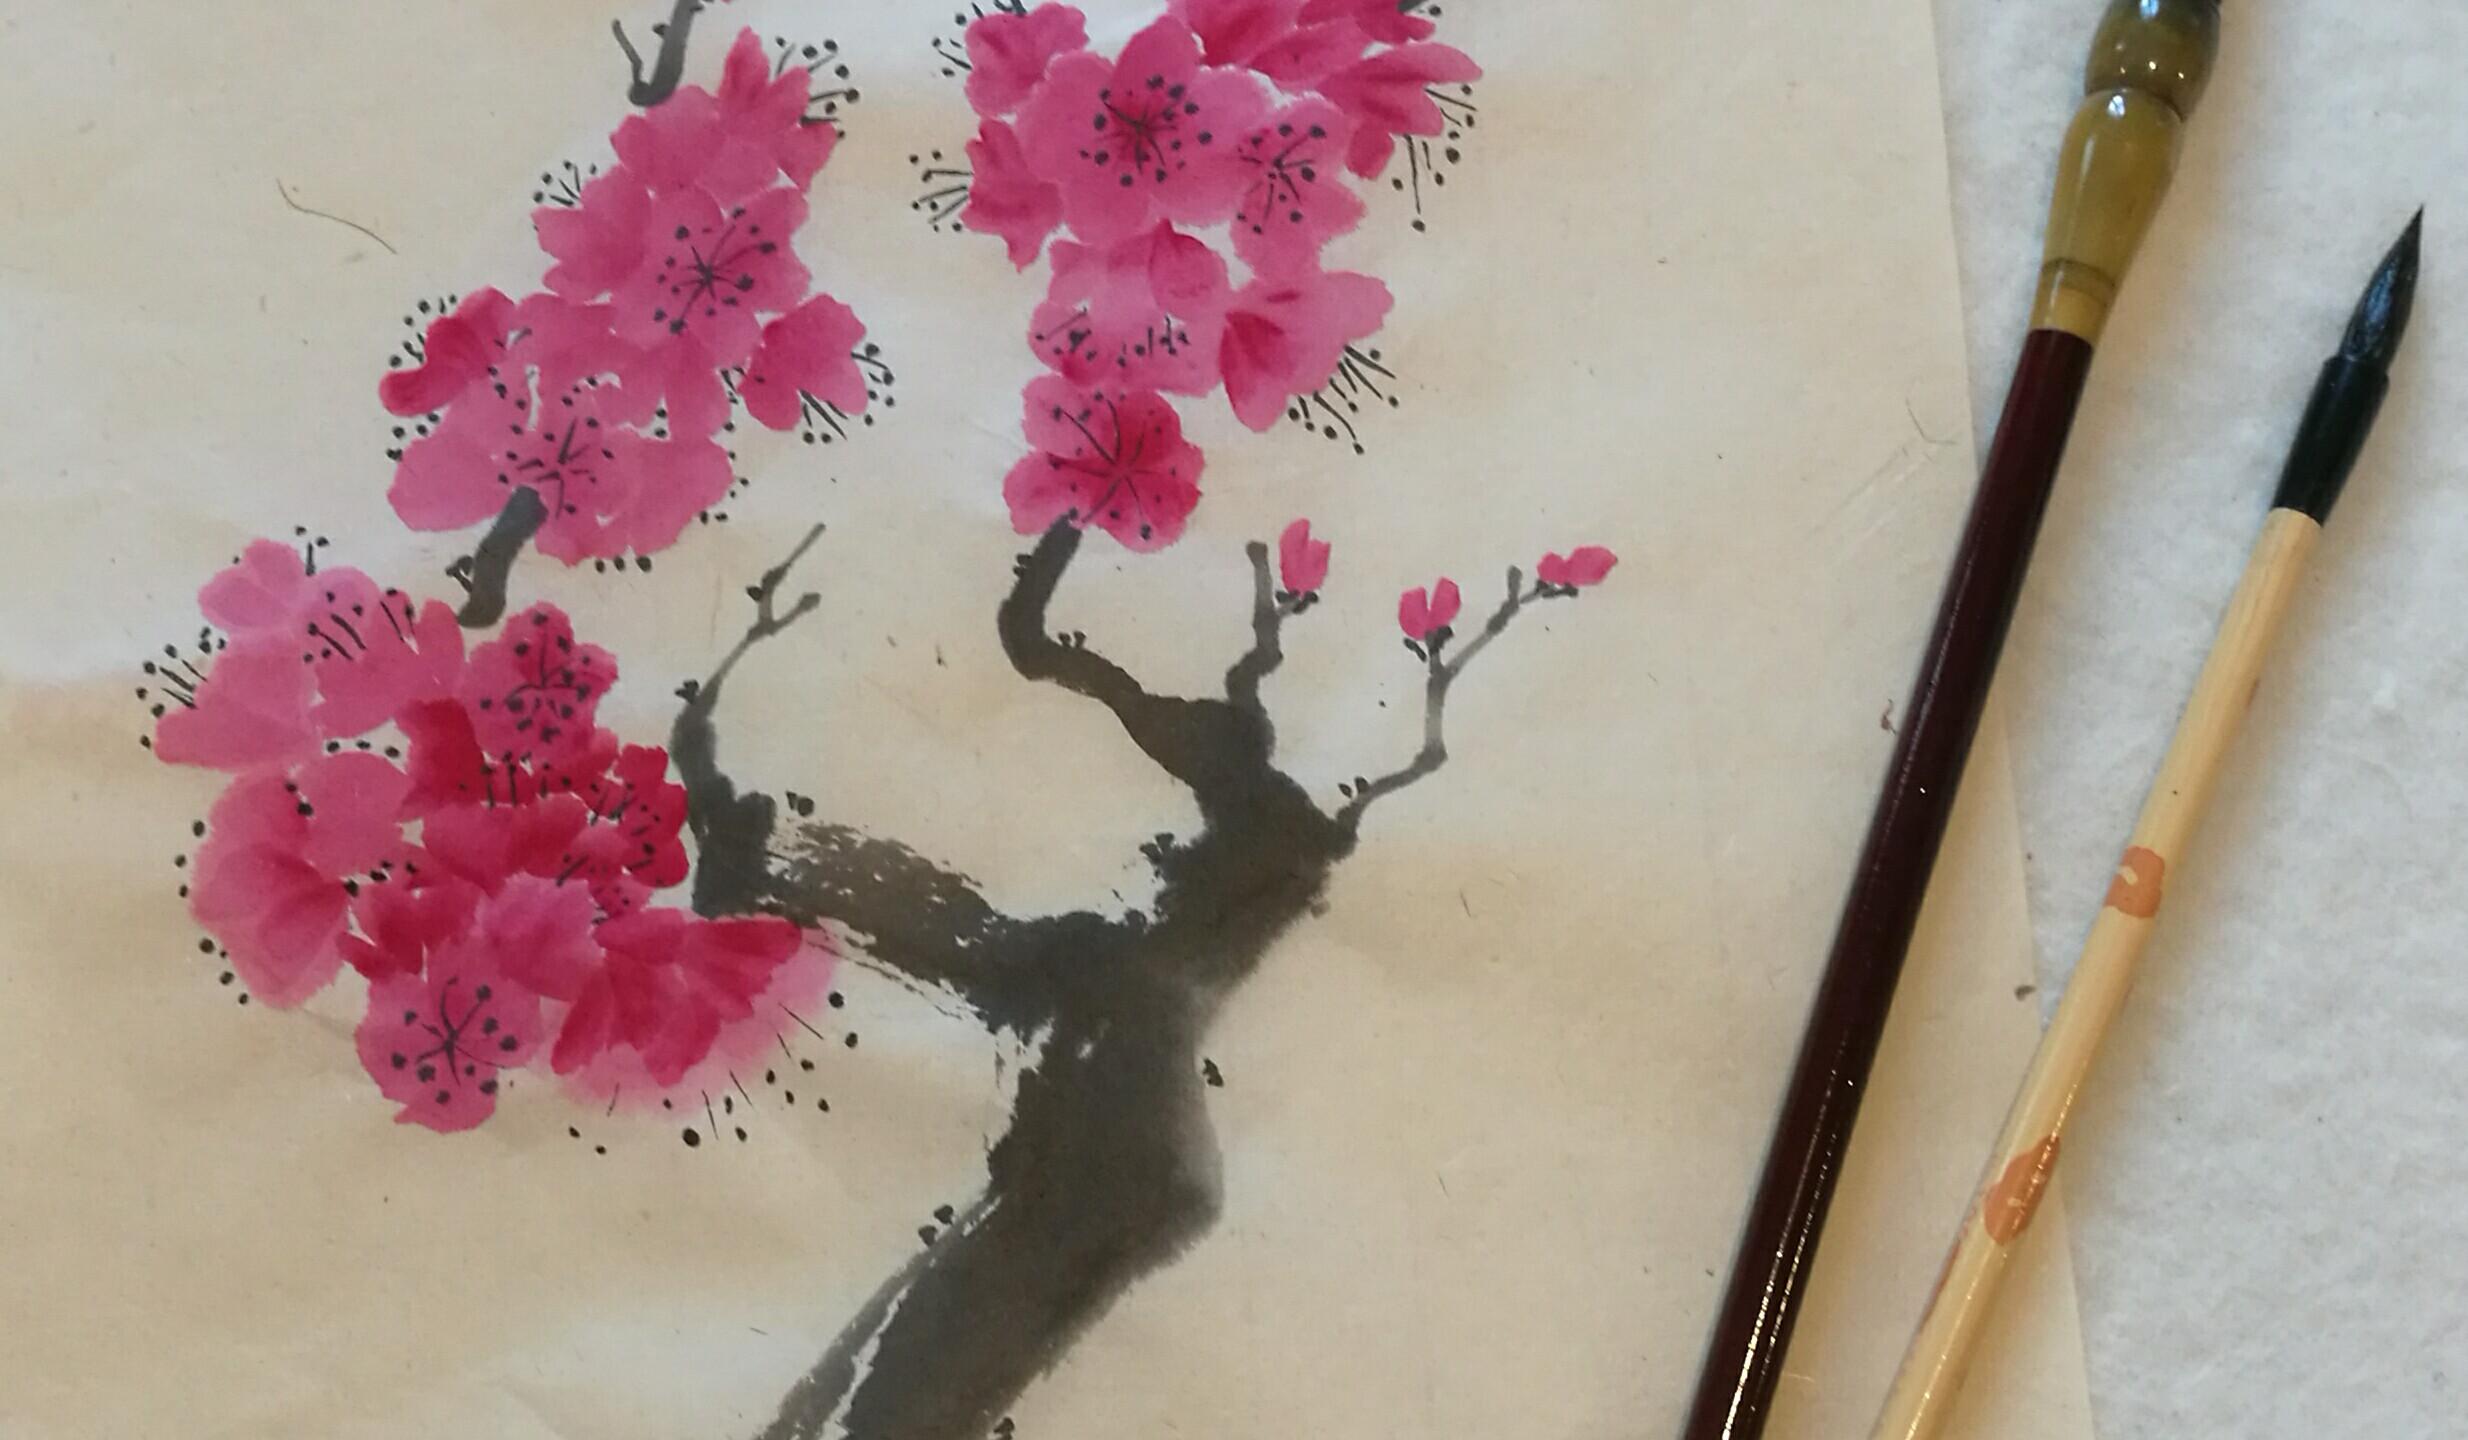 Plumb blossom